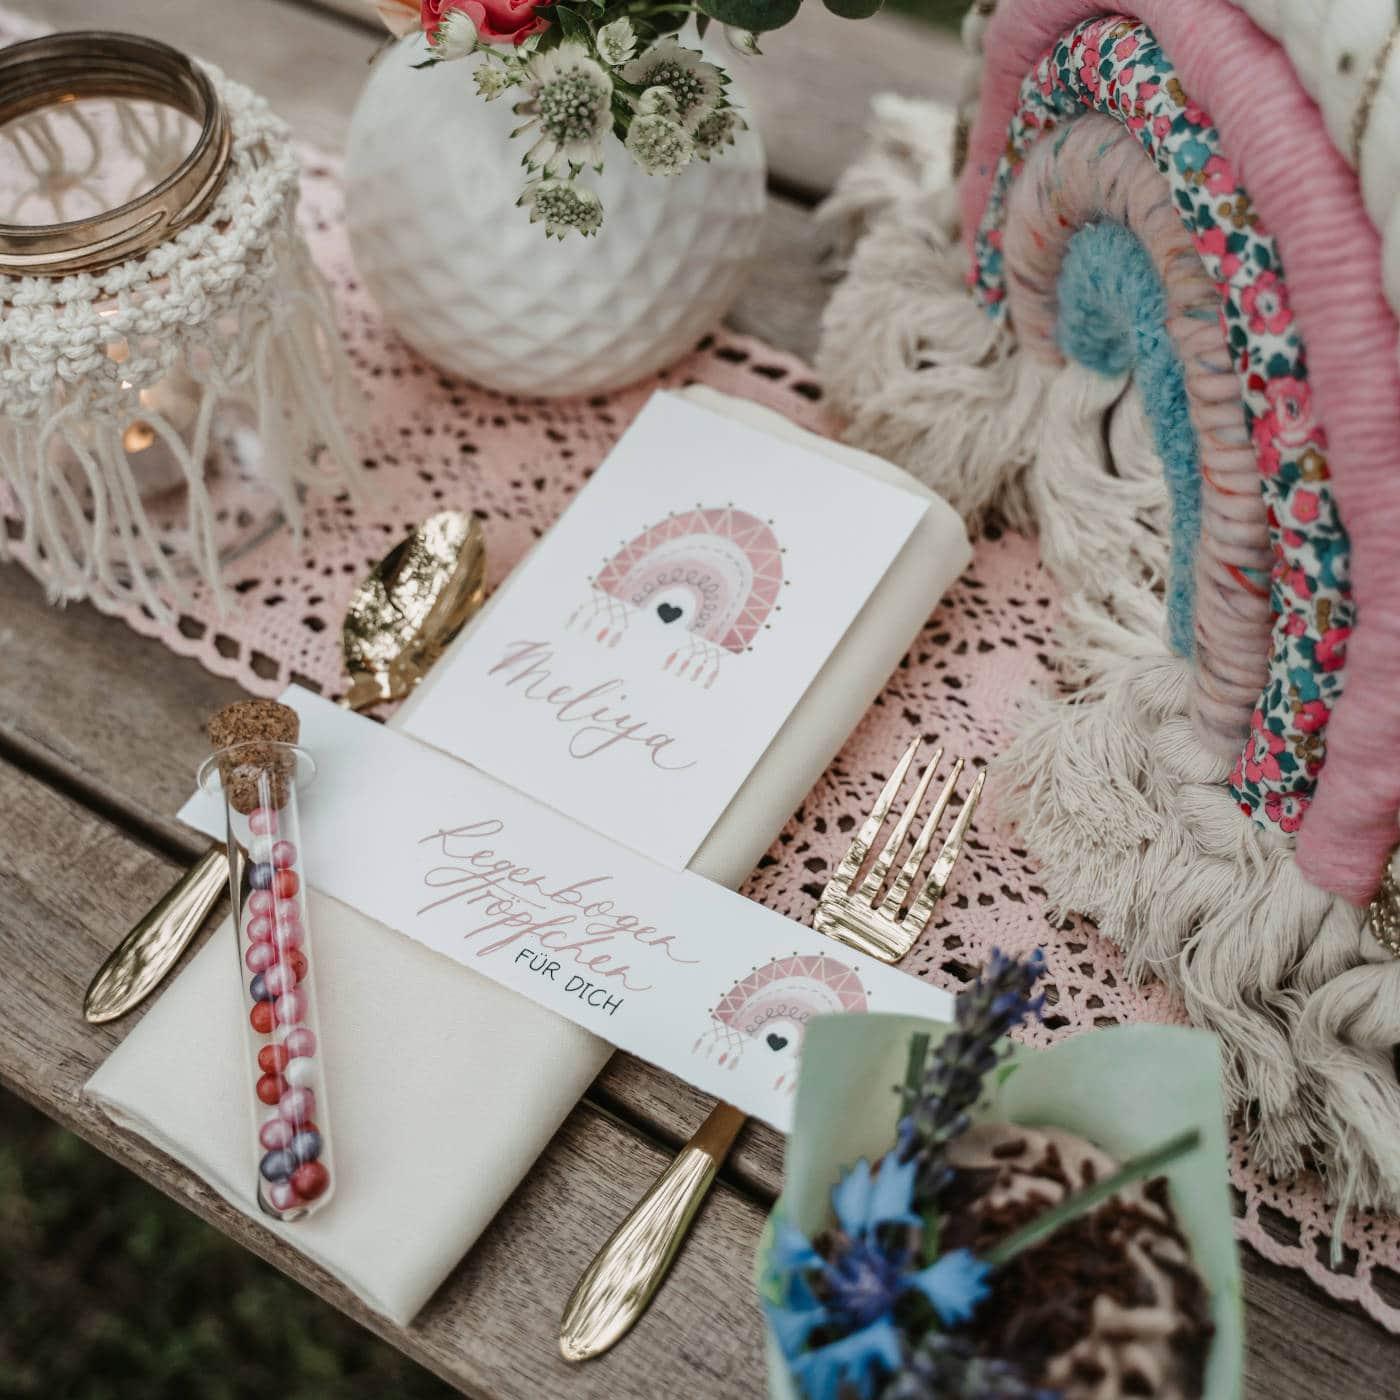 Kinderwillkommensfest feiern – Dekorationsideen // HIMBEER